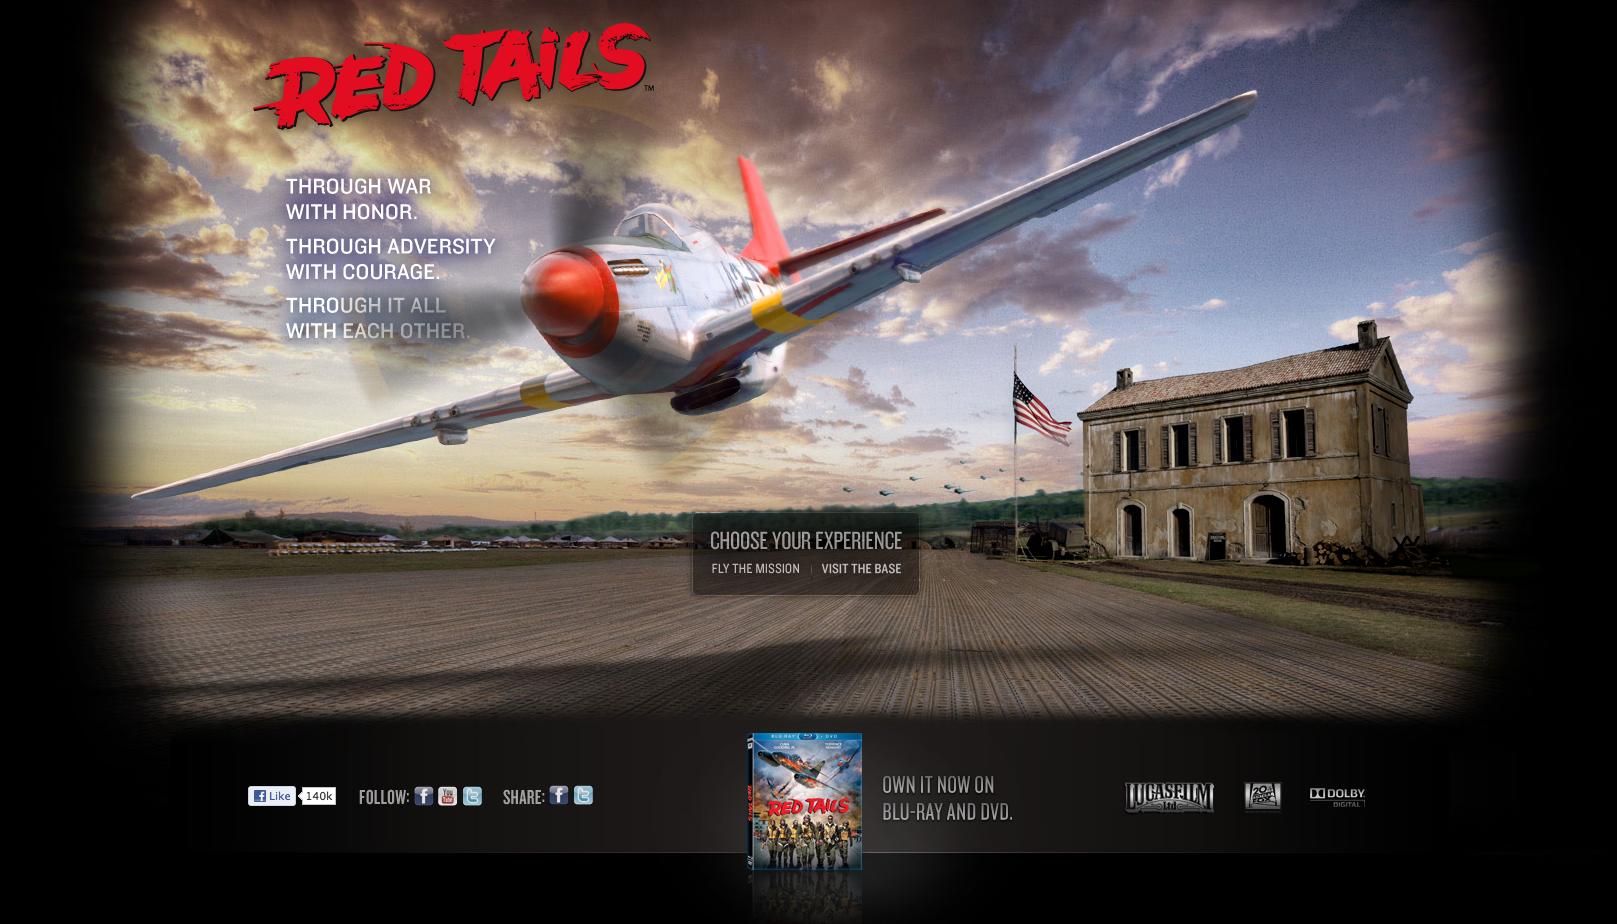 RedTails_landingPage.png